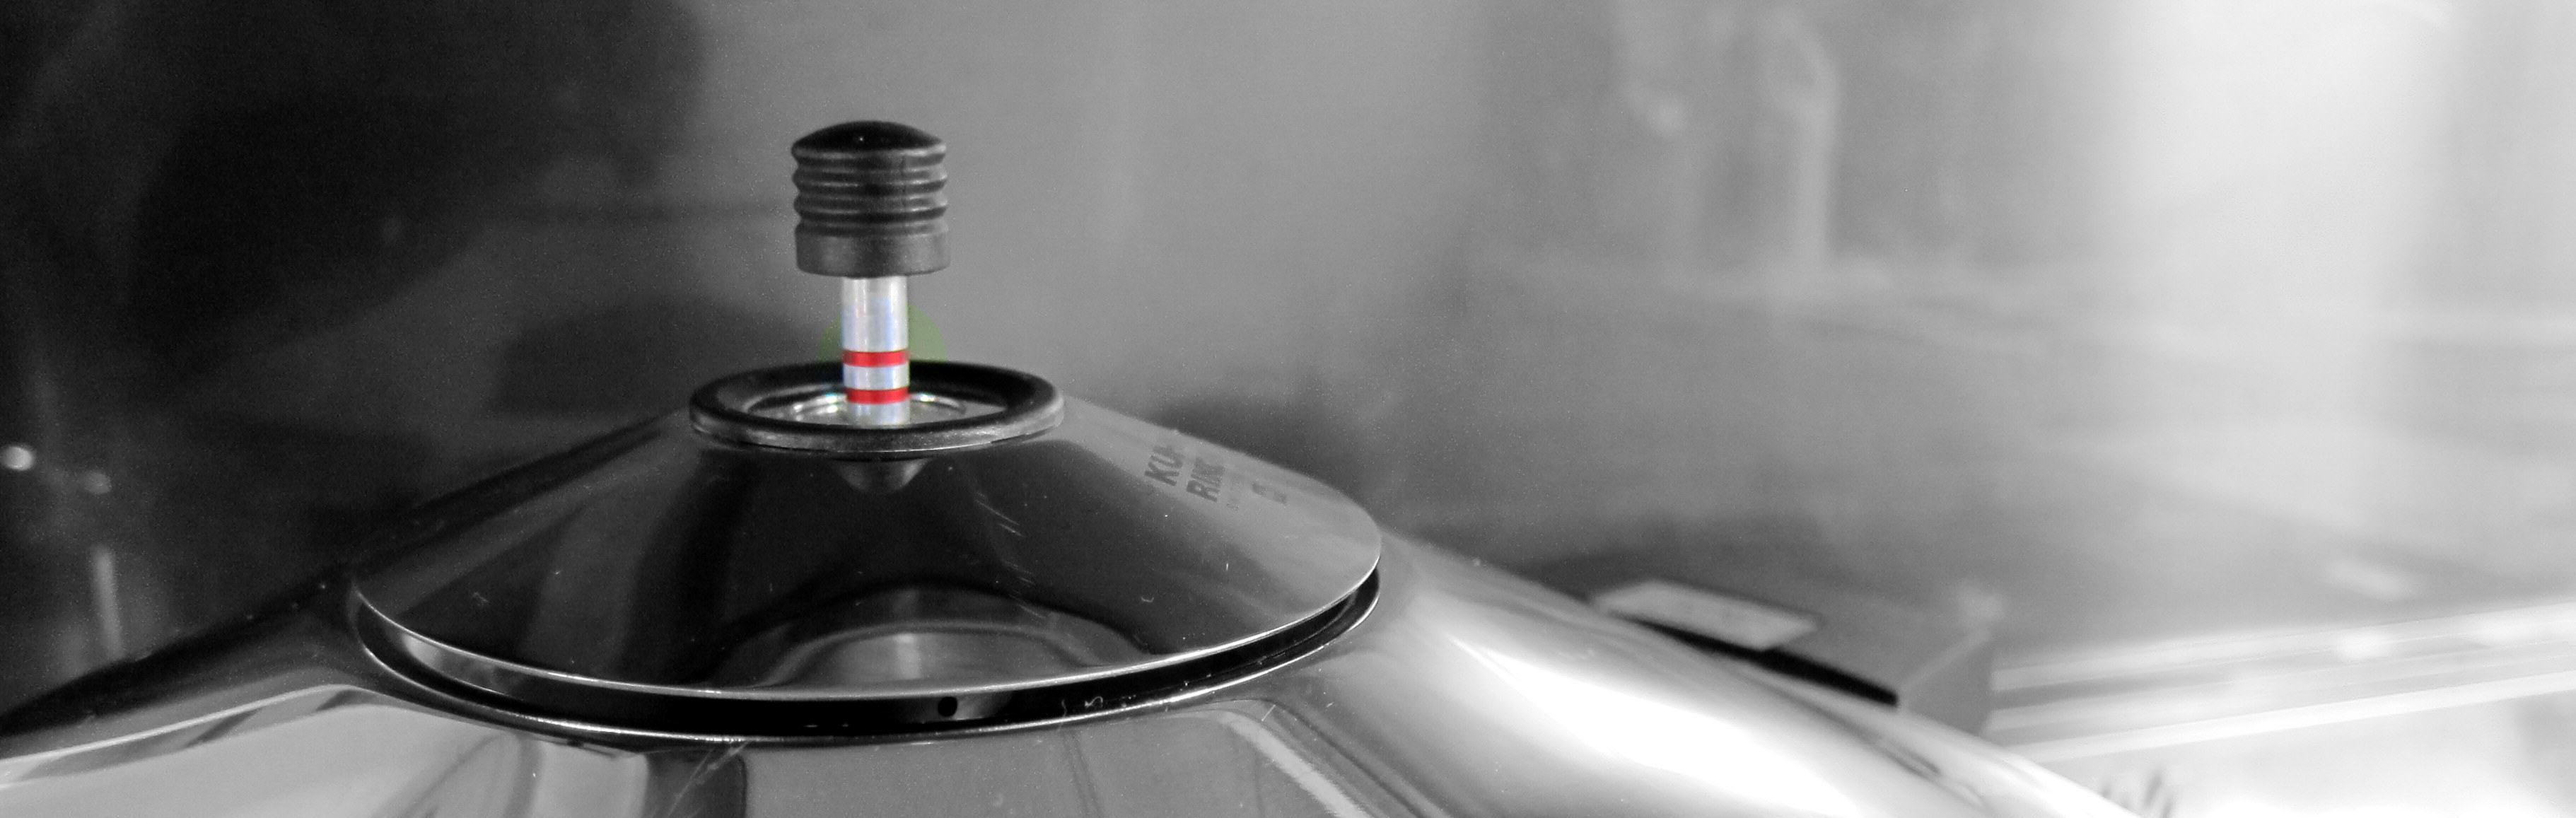 Kuhn Rikon Pressure Cooker Recipe